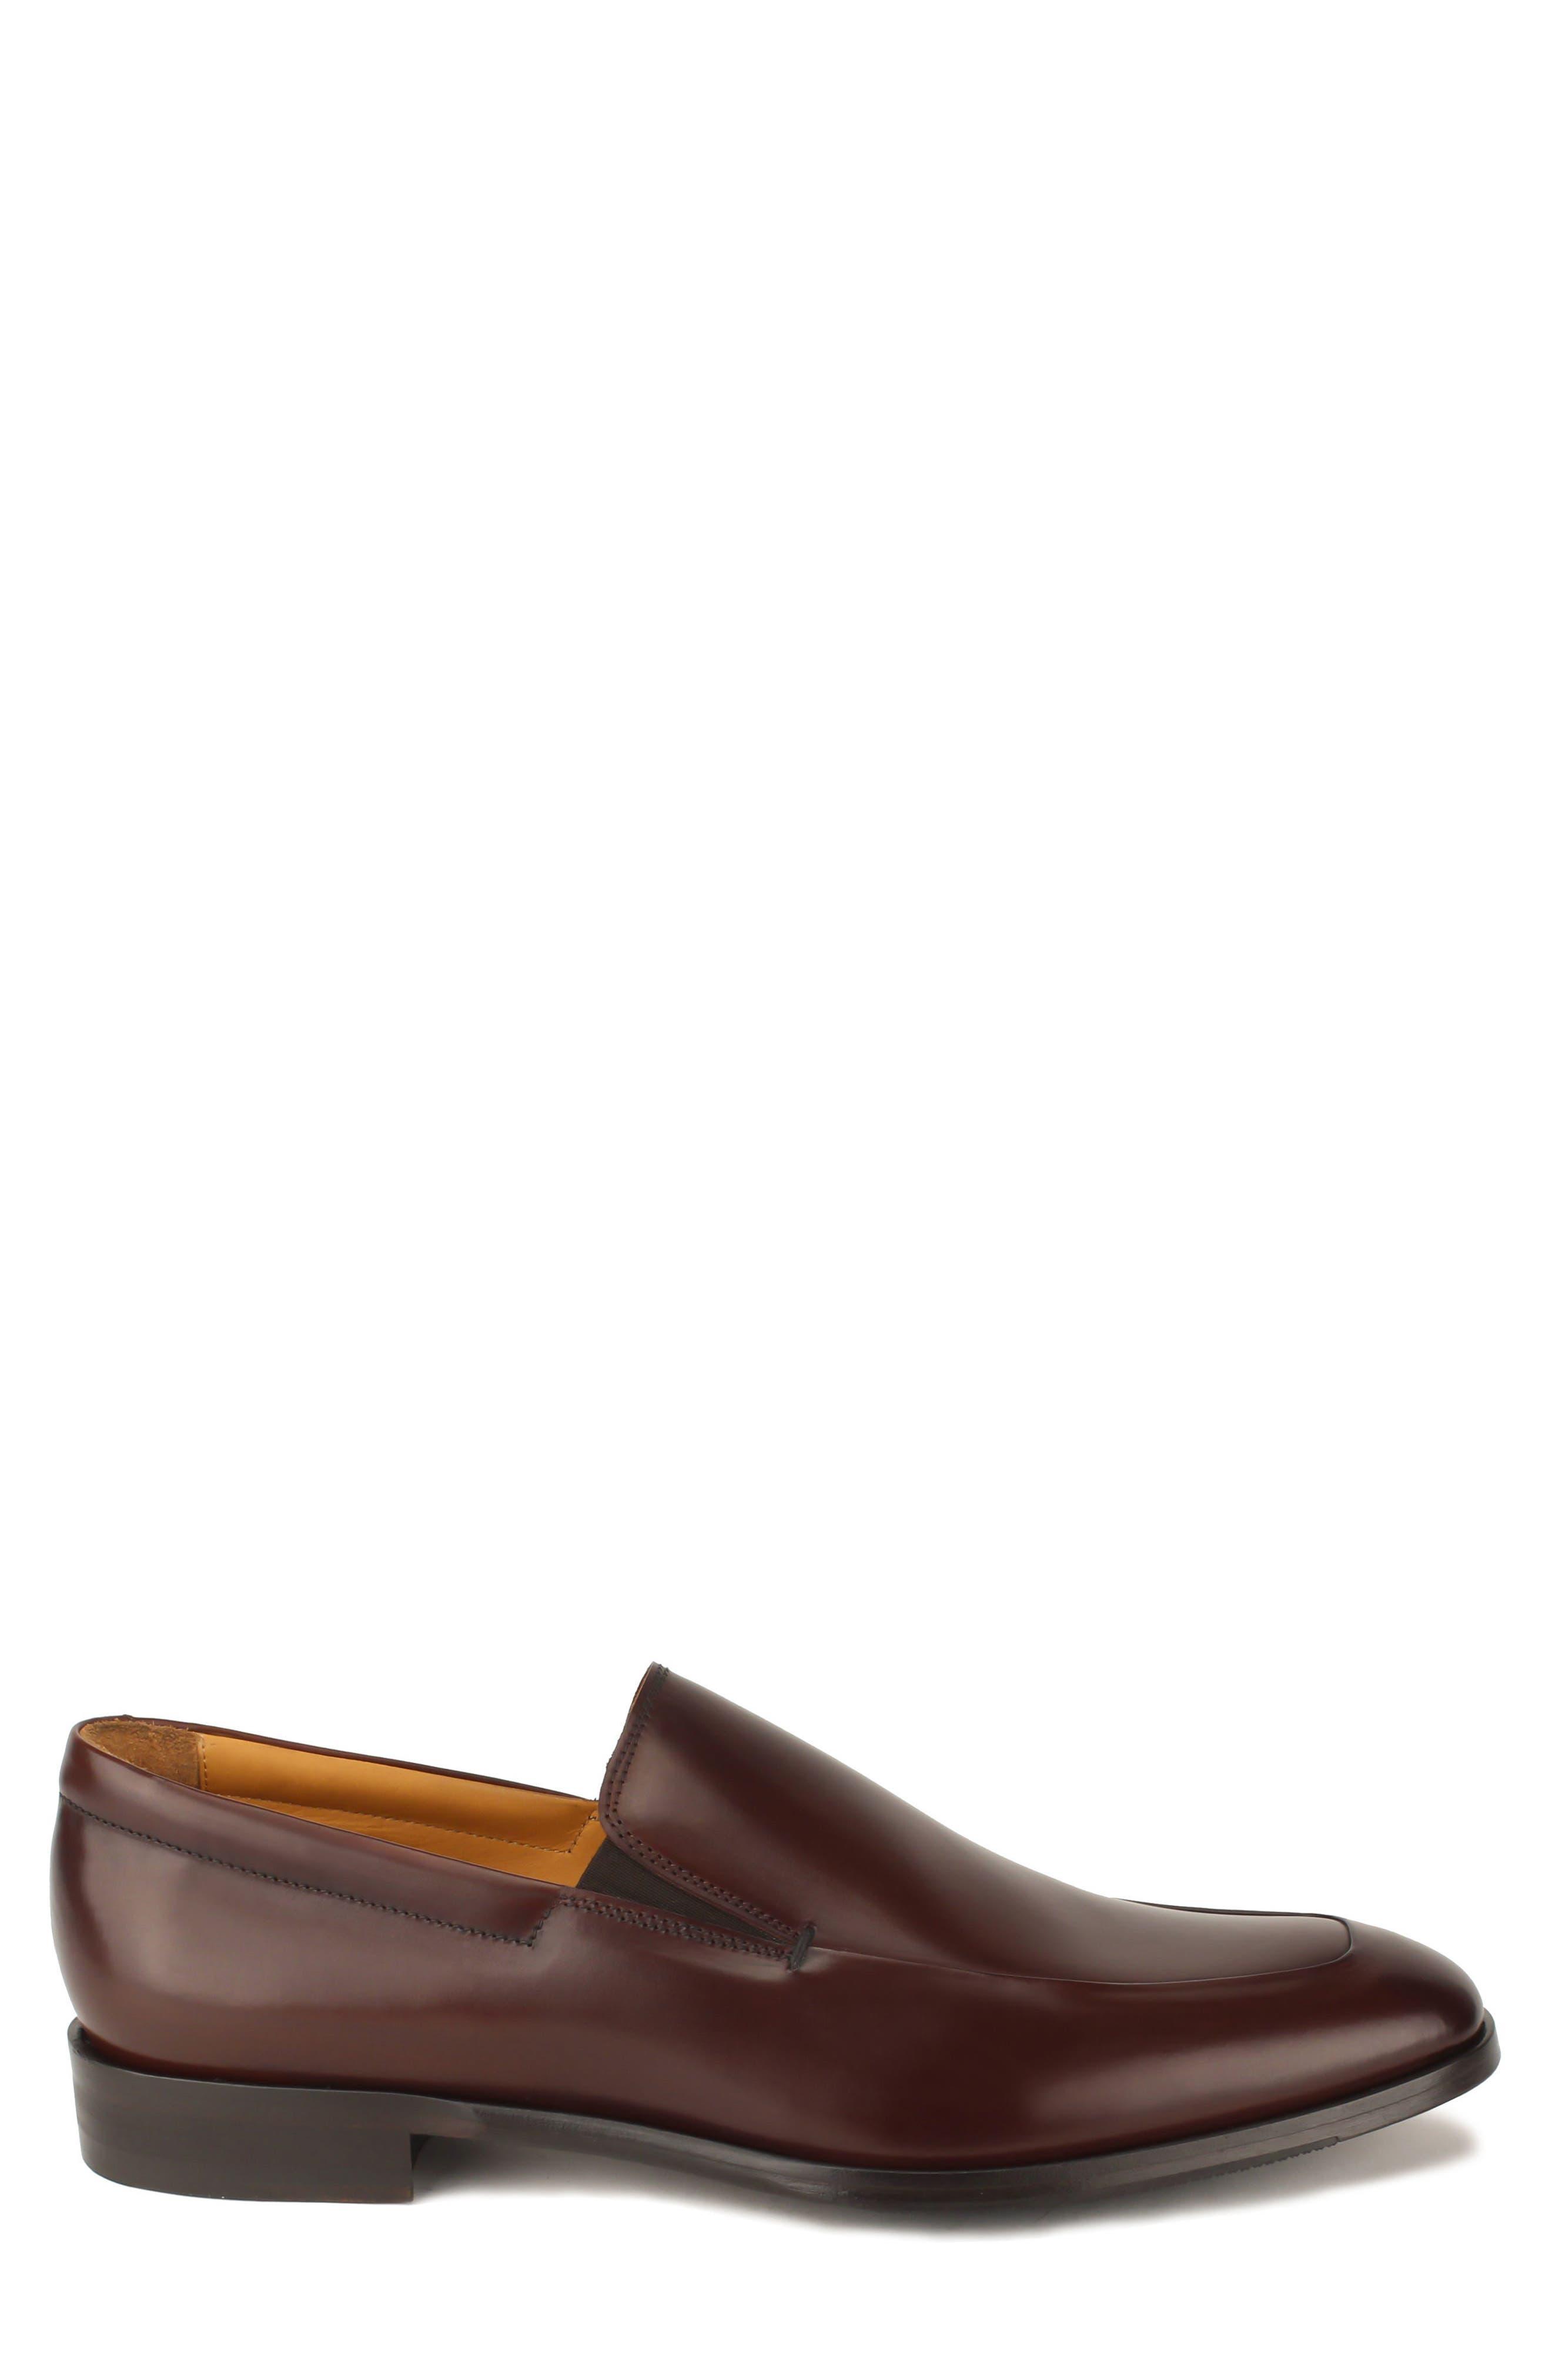 Brighton II Venetian Loafer,                             Alternate thumbnail 3, color,                             Bourbon Leather